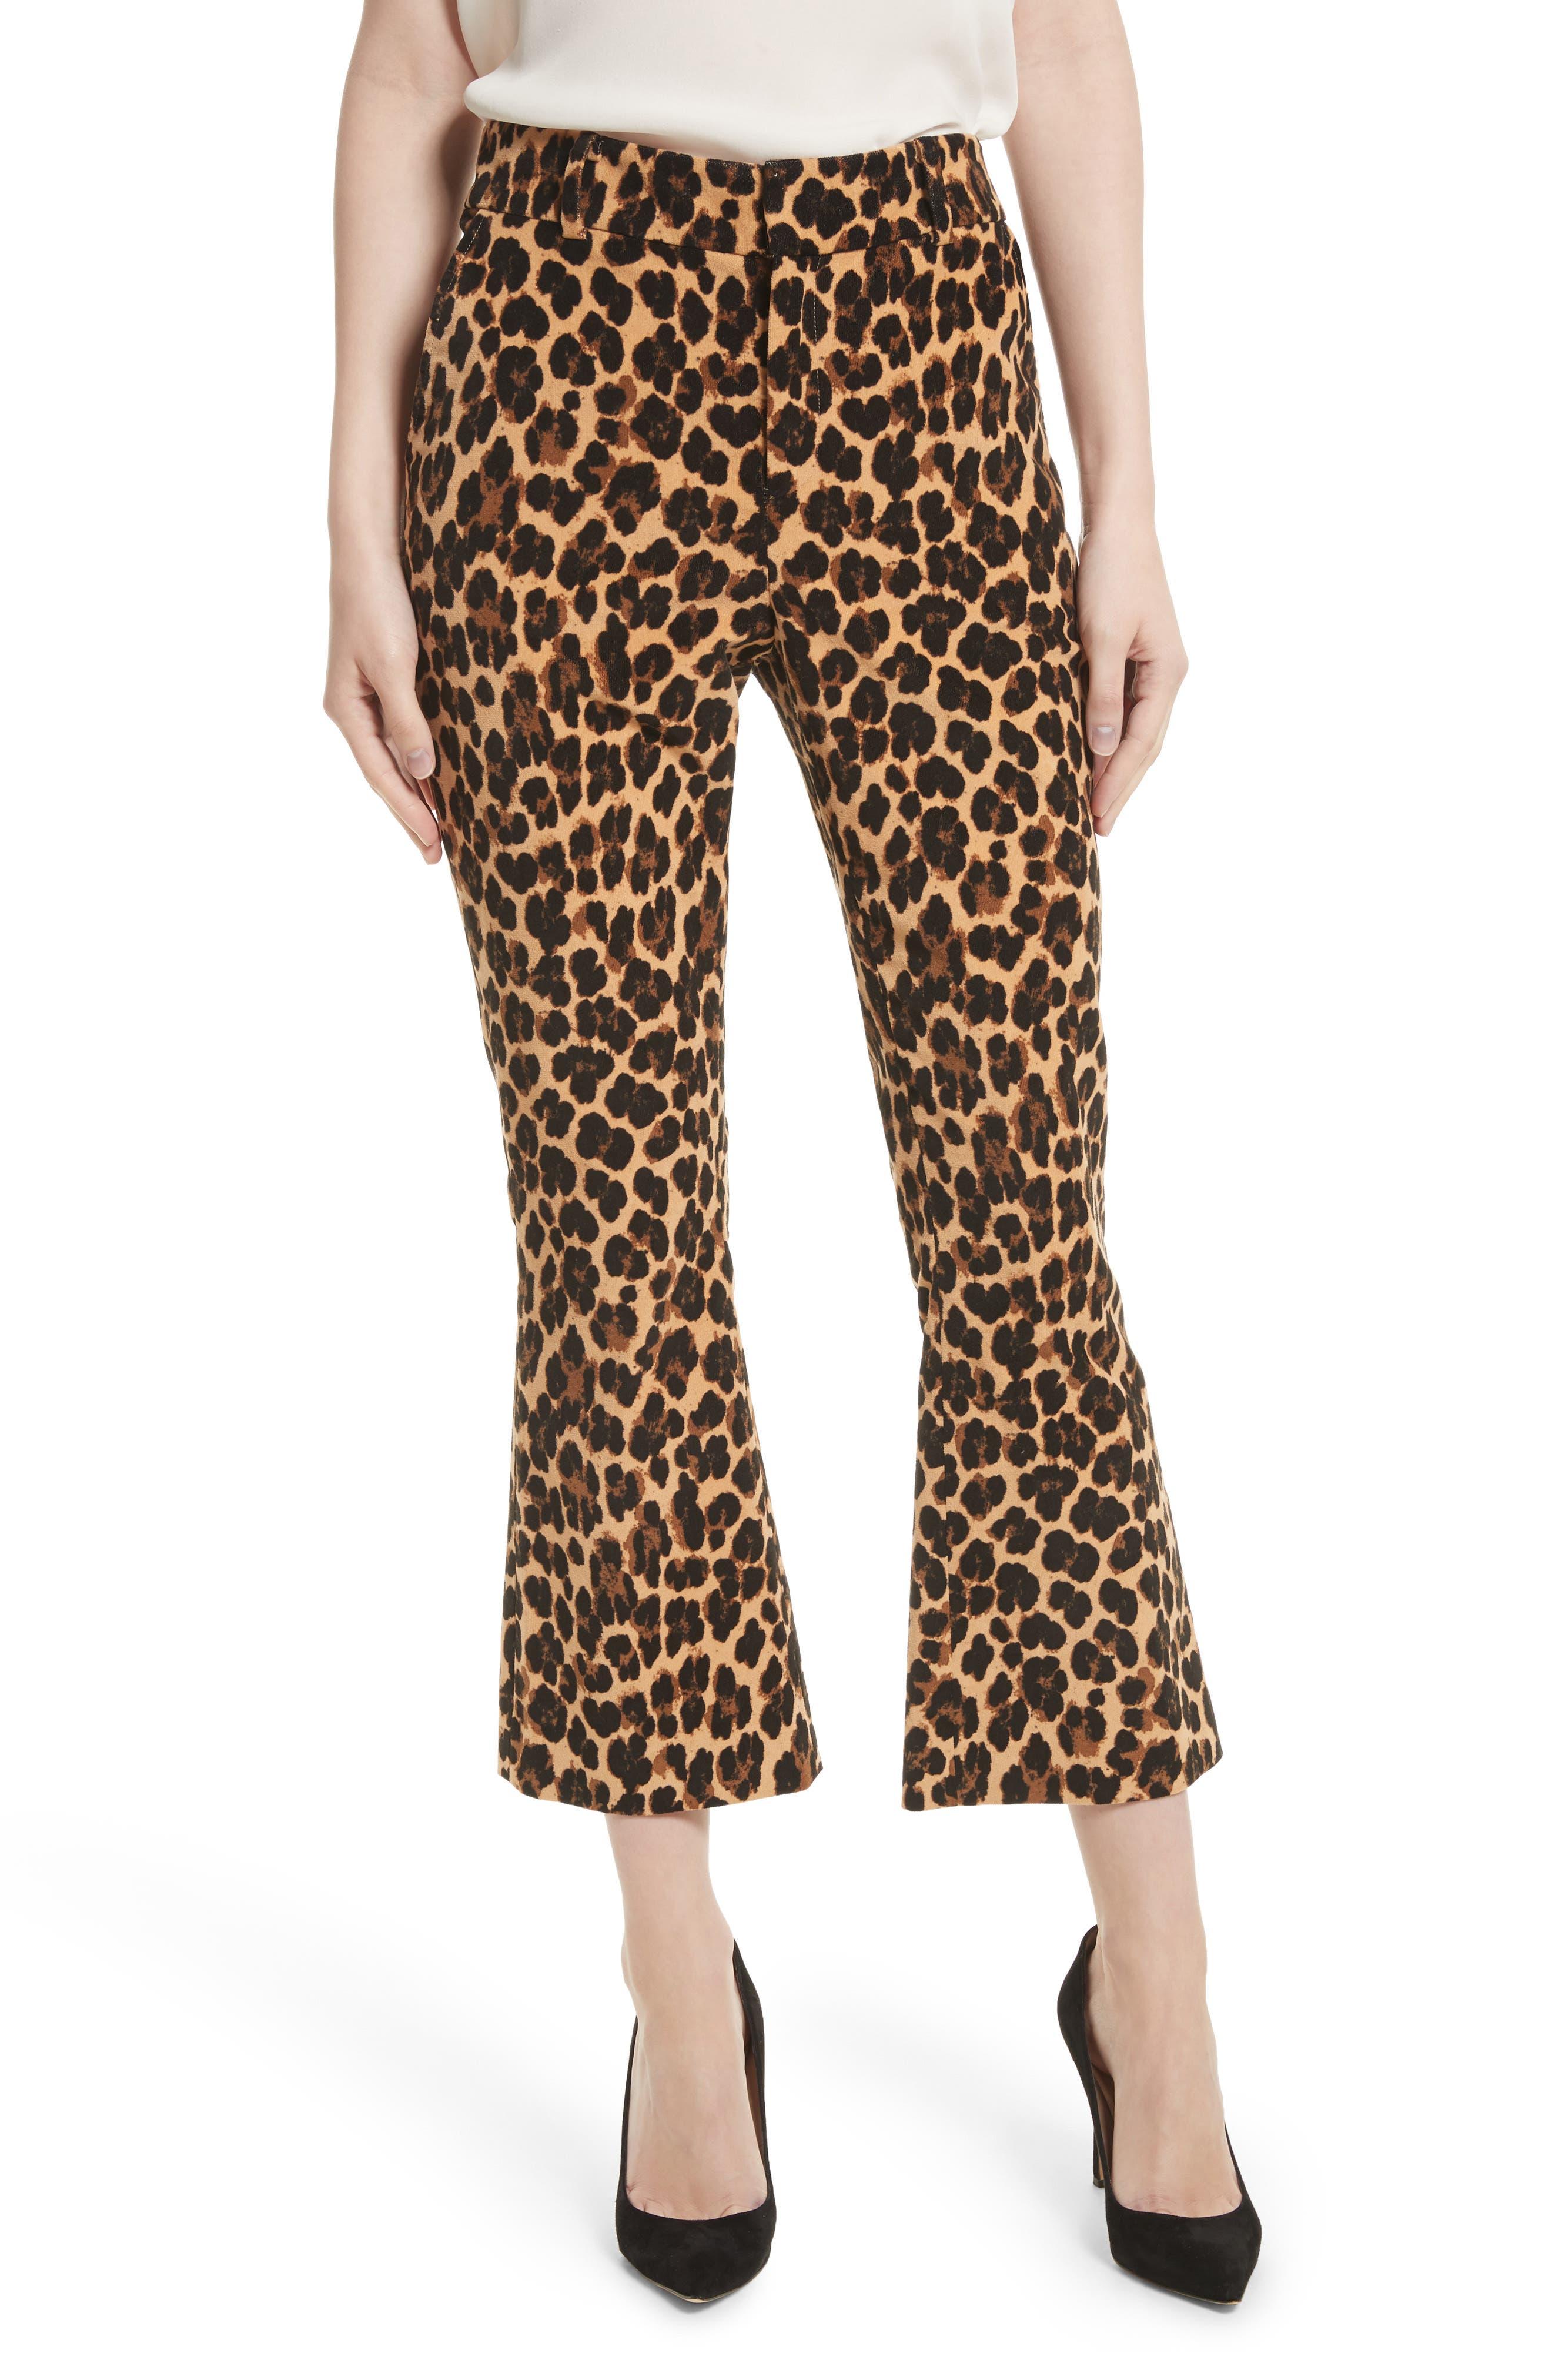 Alternate Image 1 Selected - FRAME Cheetah Print Velvet Crop Flare Pants